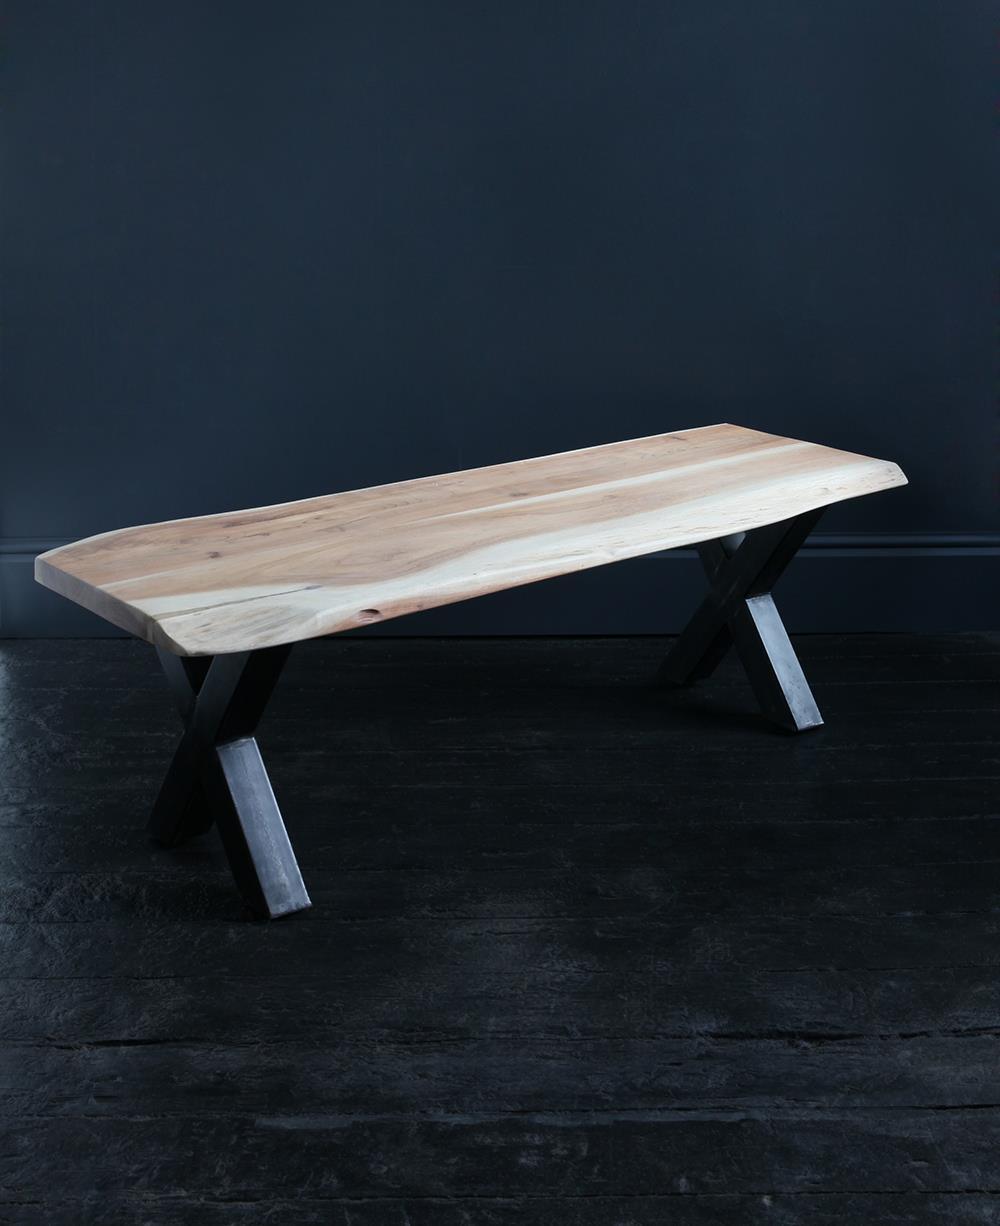 Natural Edge Acacia Bench Seat 180 x 45 cm